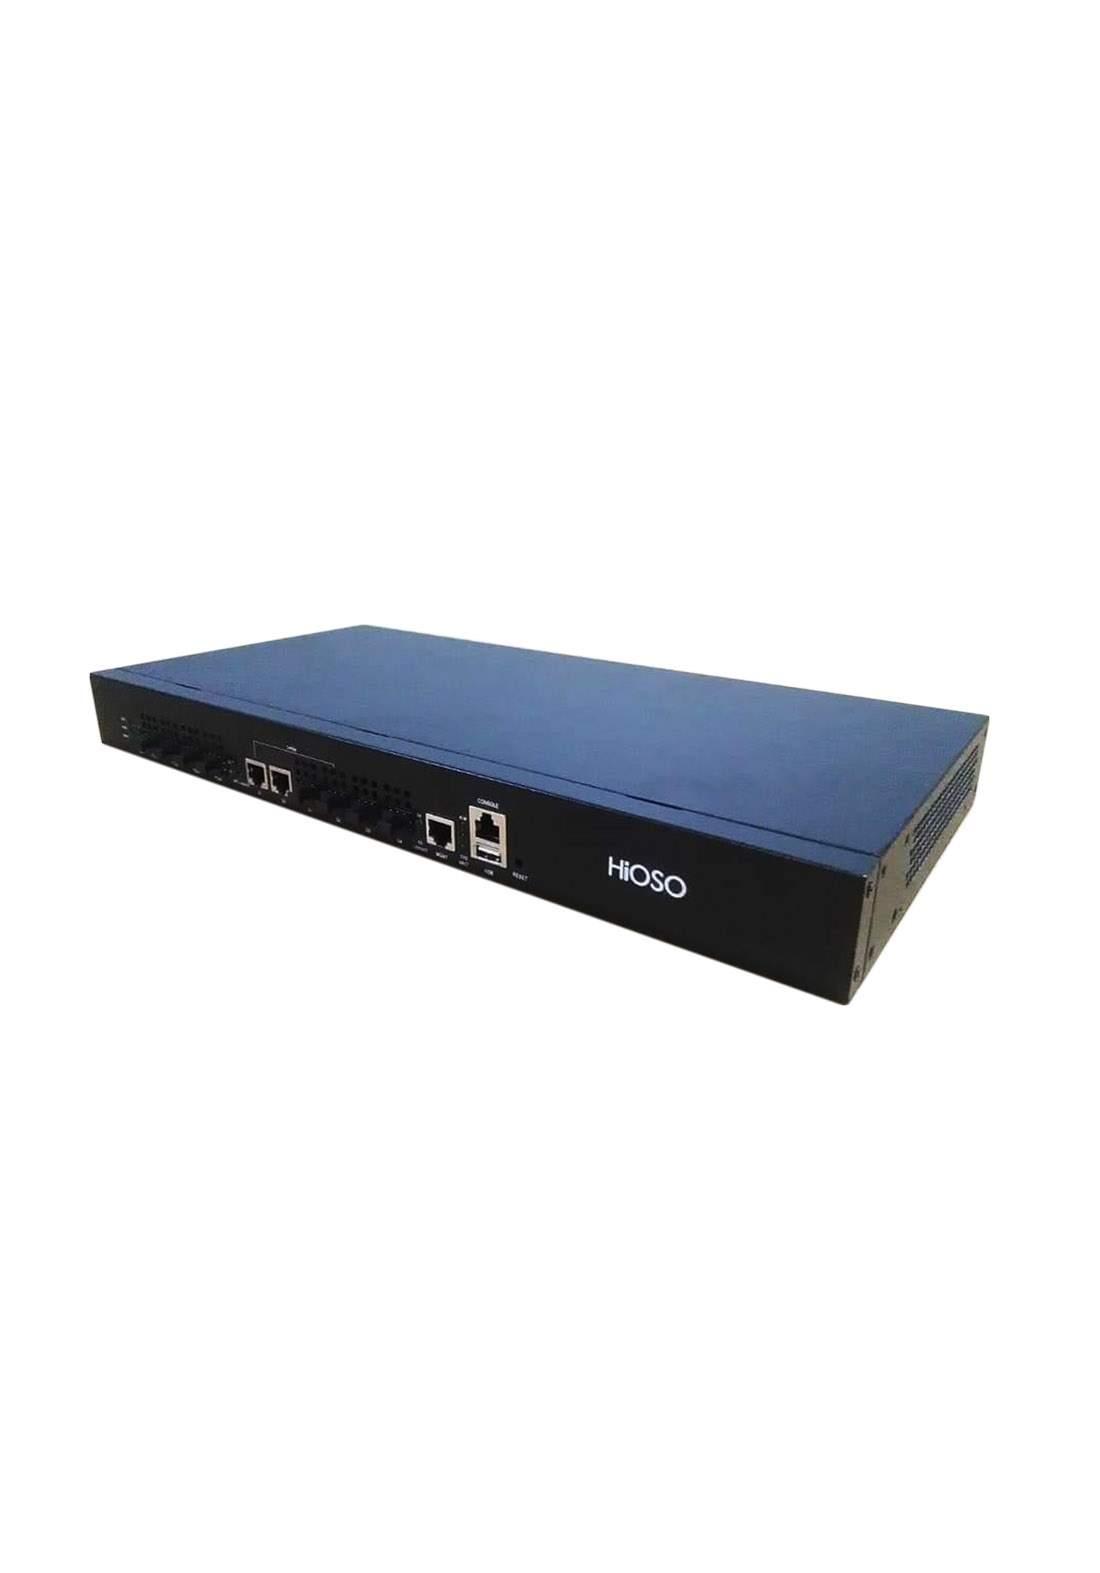 Hioso Epon OLT 2 Pon with 4 SFP power supply - Black